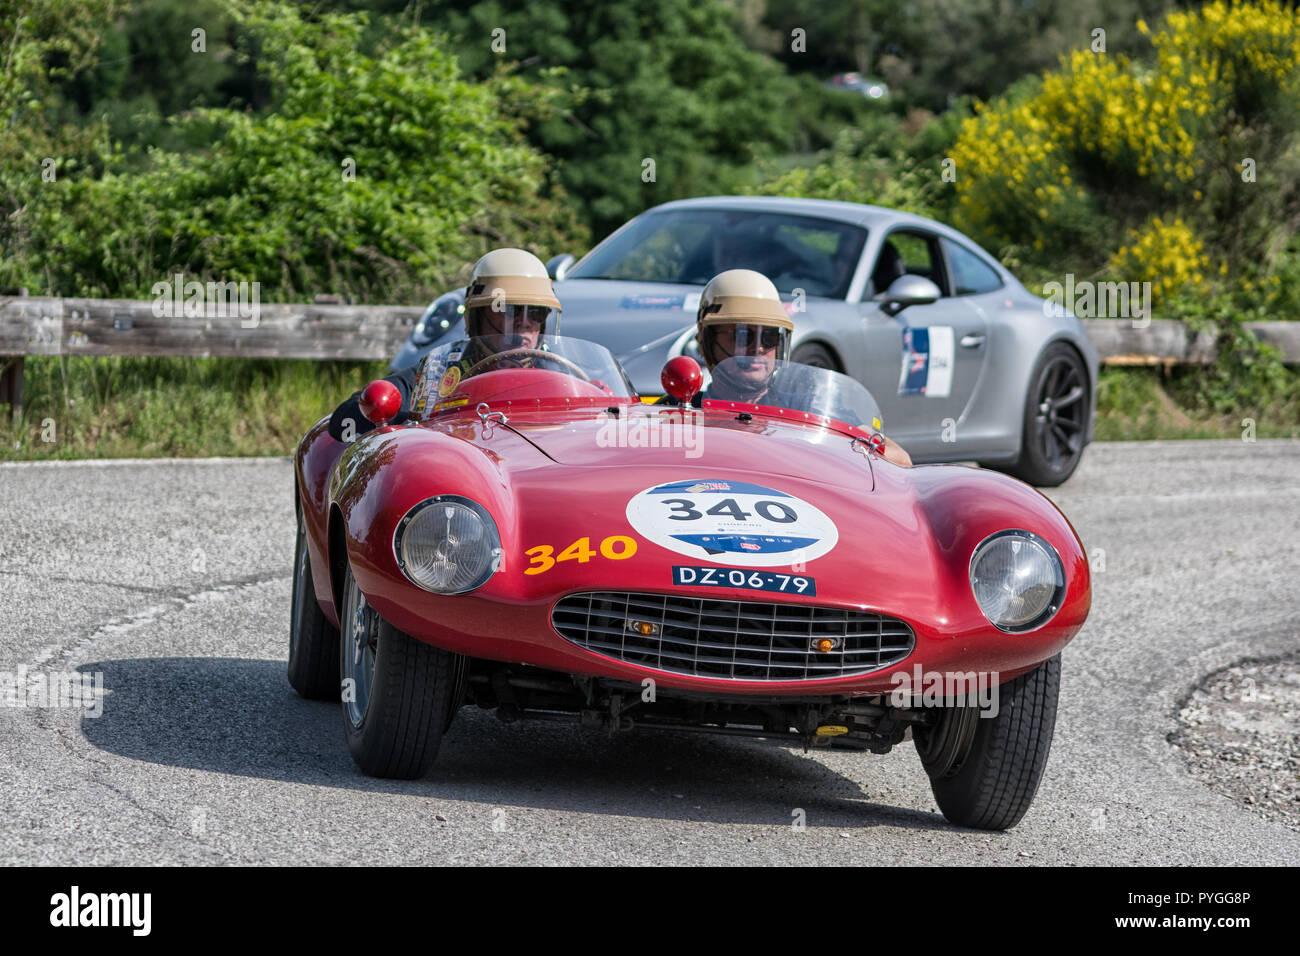 hight resolution of pesaro colle san bartolo italy may 17 2018 ferrari 750 monza spider scaglietti 1954 old racing car in mille miglia rally 2018 the famous italian